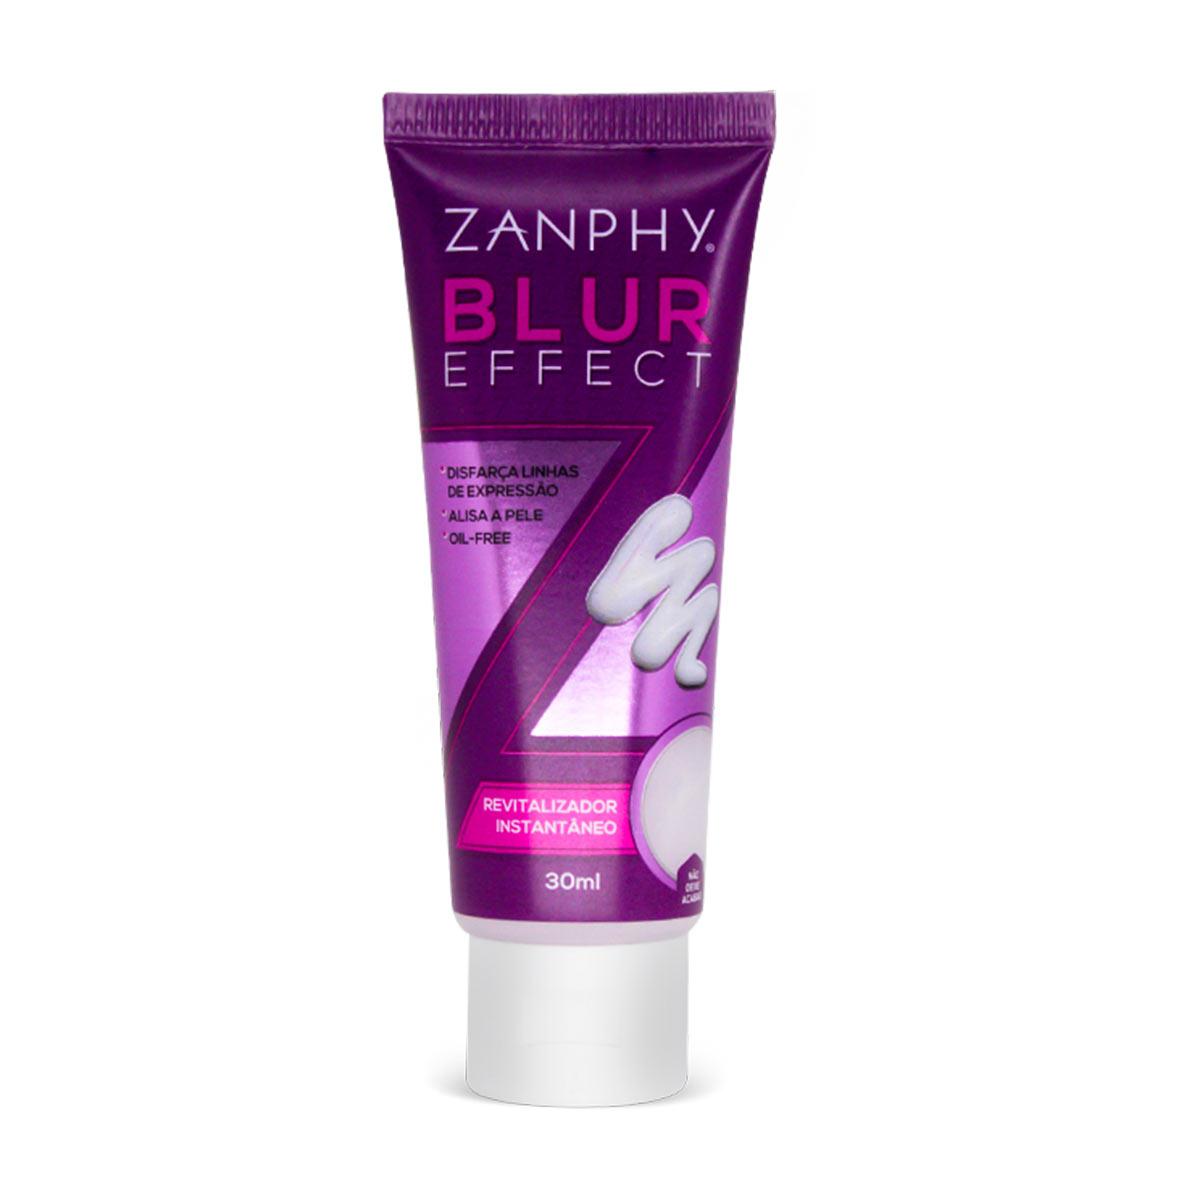 BLUR EFFECT Zanphy